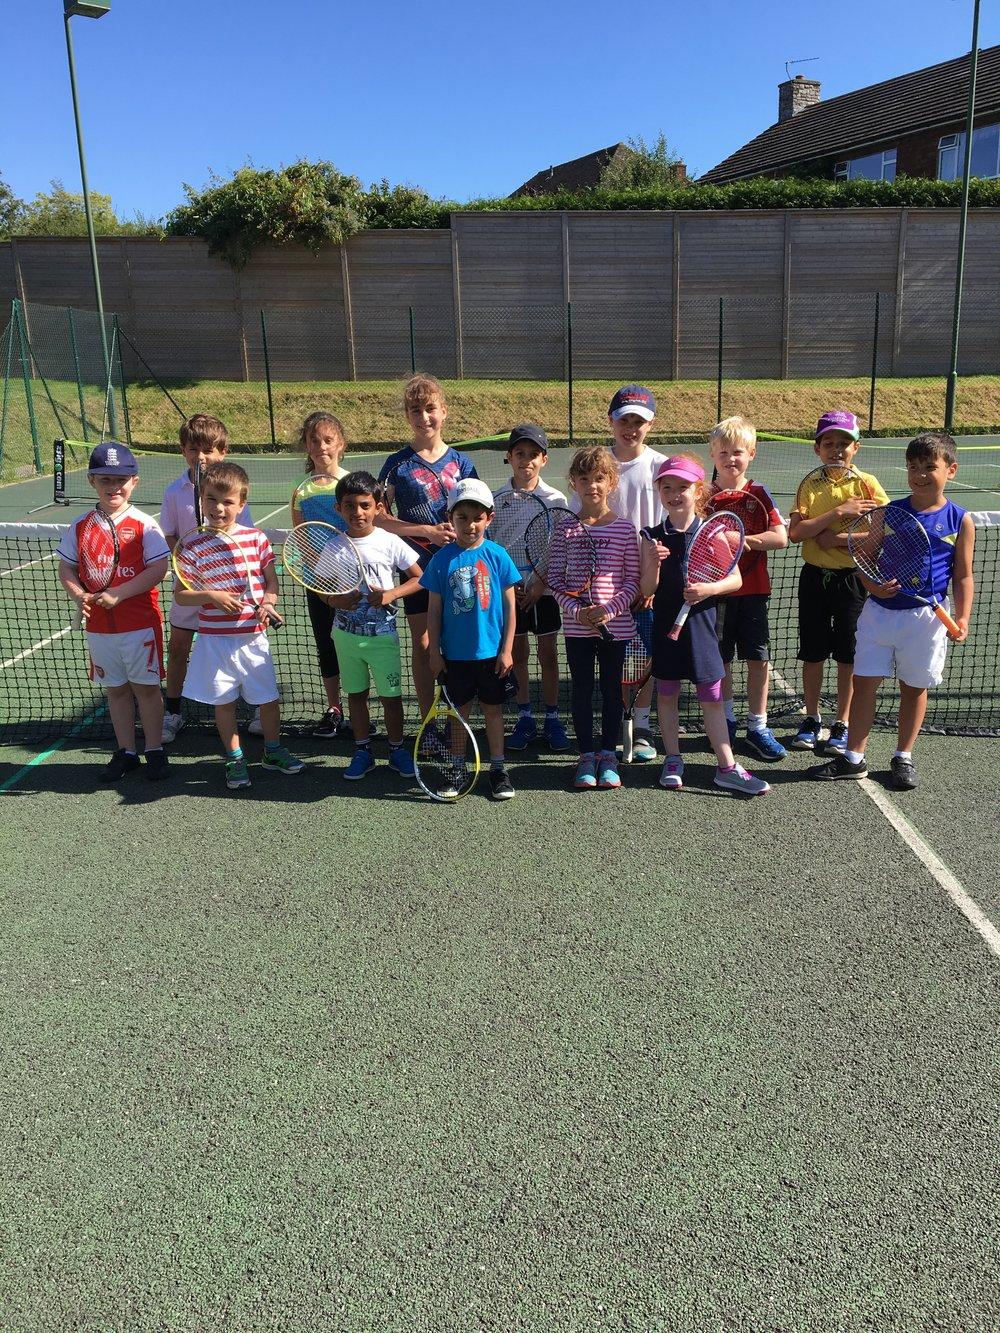 Seen here are Sundridge Park's new little tennis superstars!